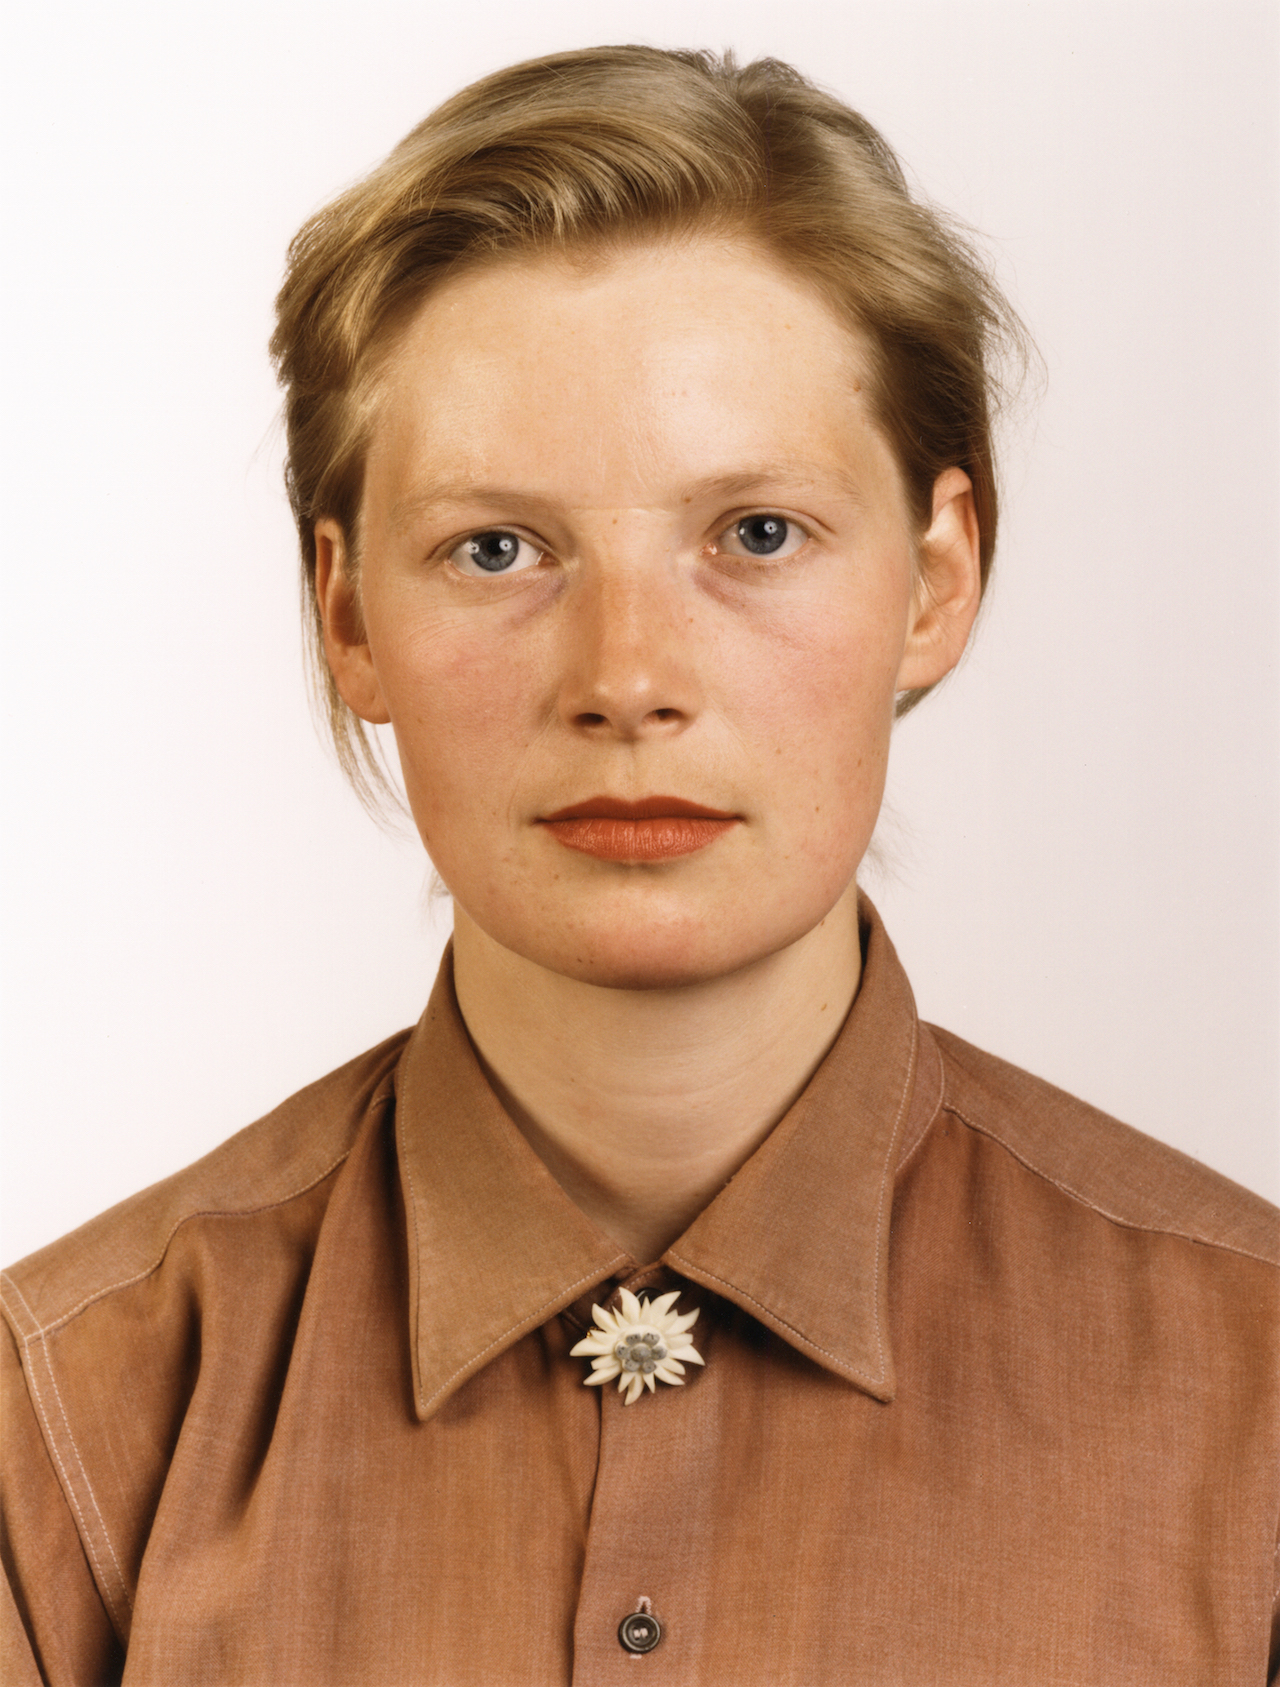 Fig. 1.  Porträt (P Stadtbäumer)  (1988)